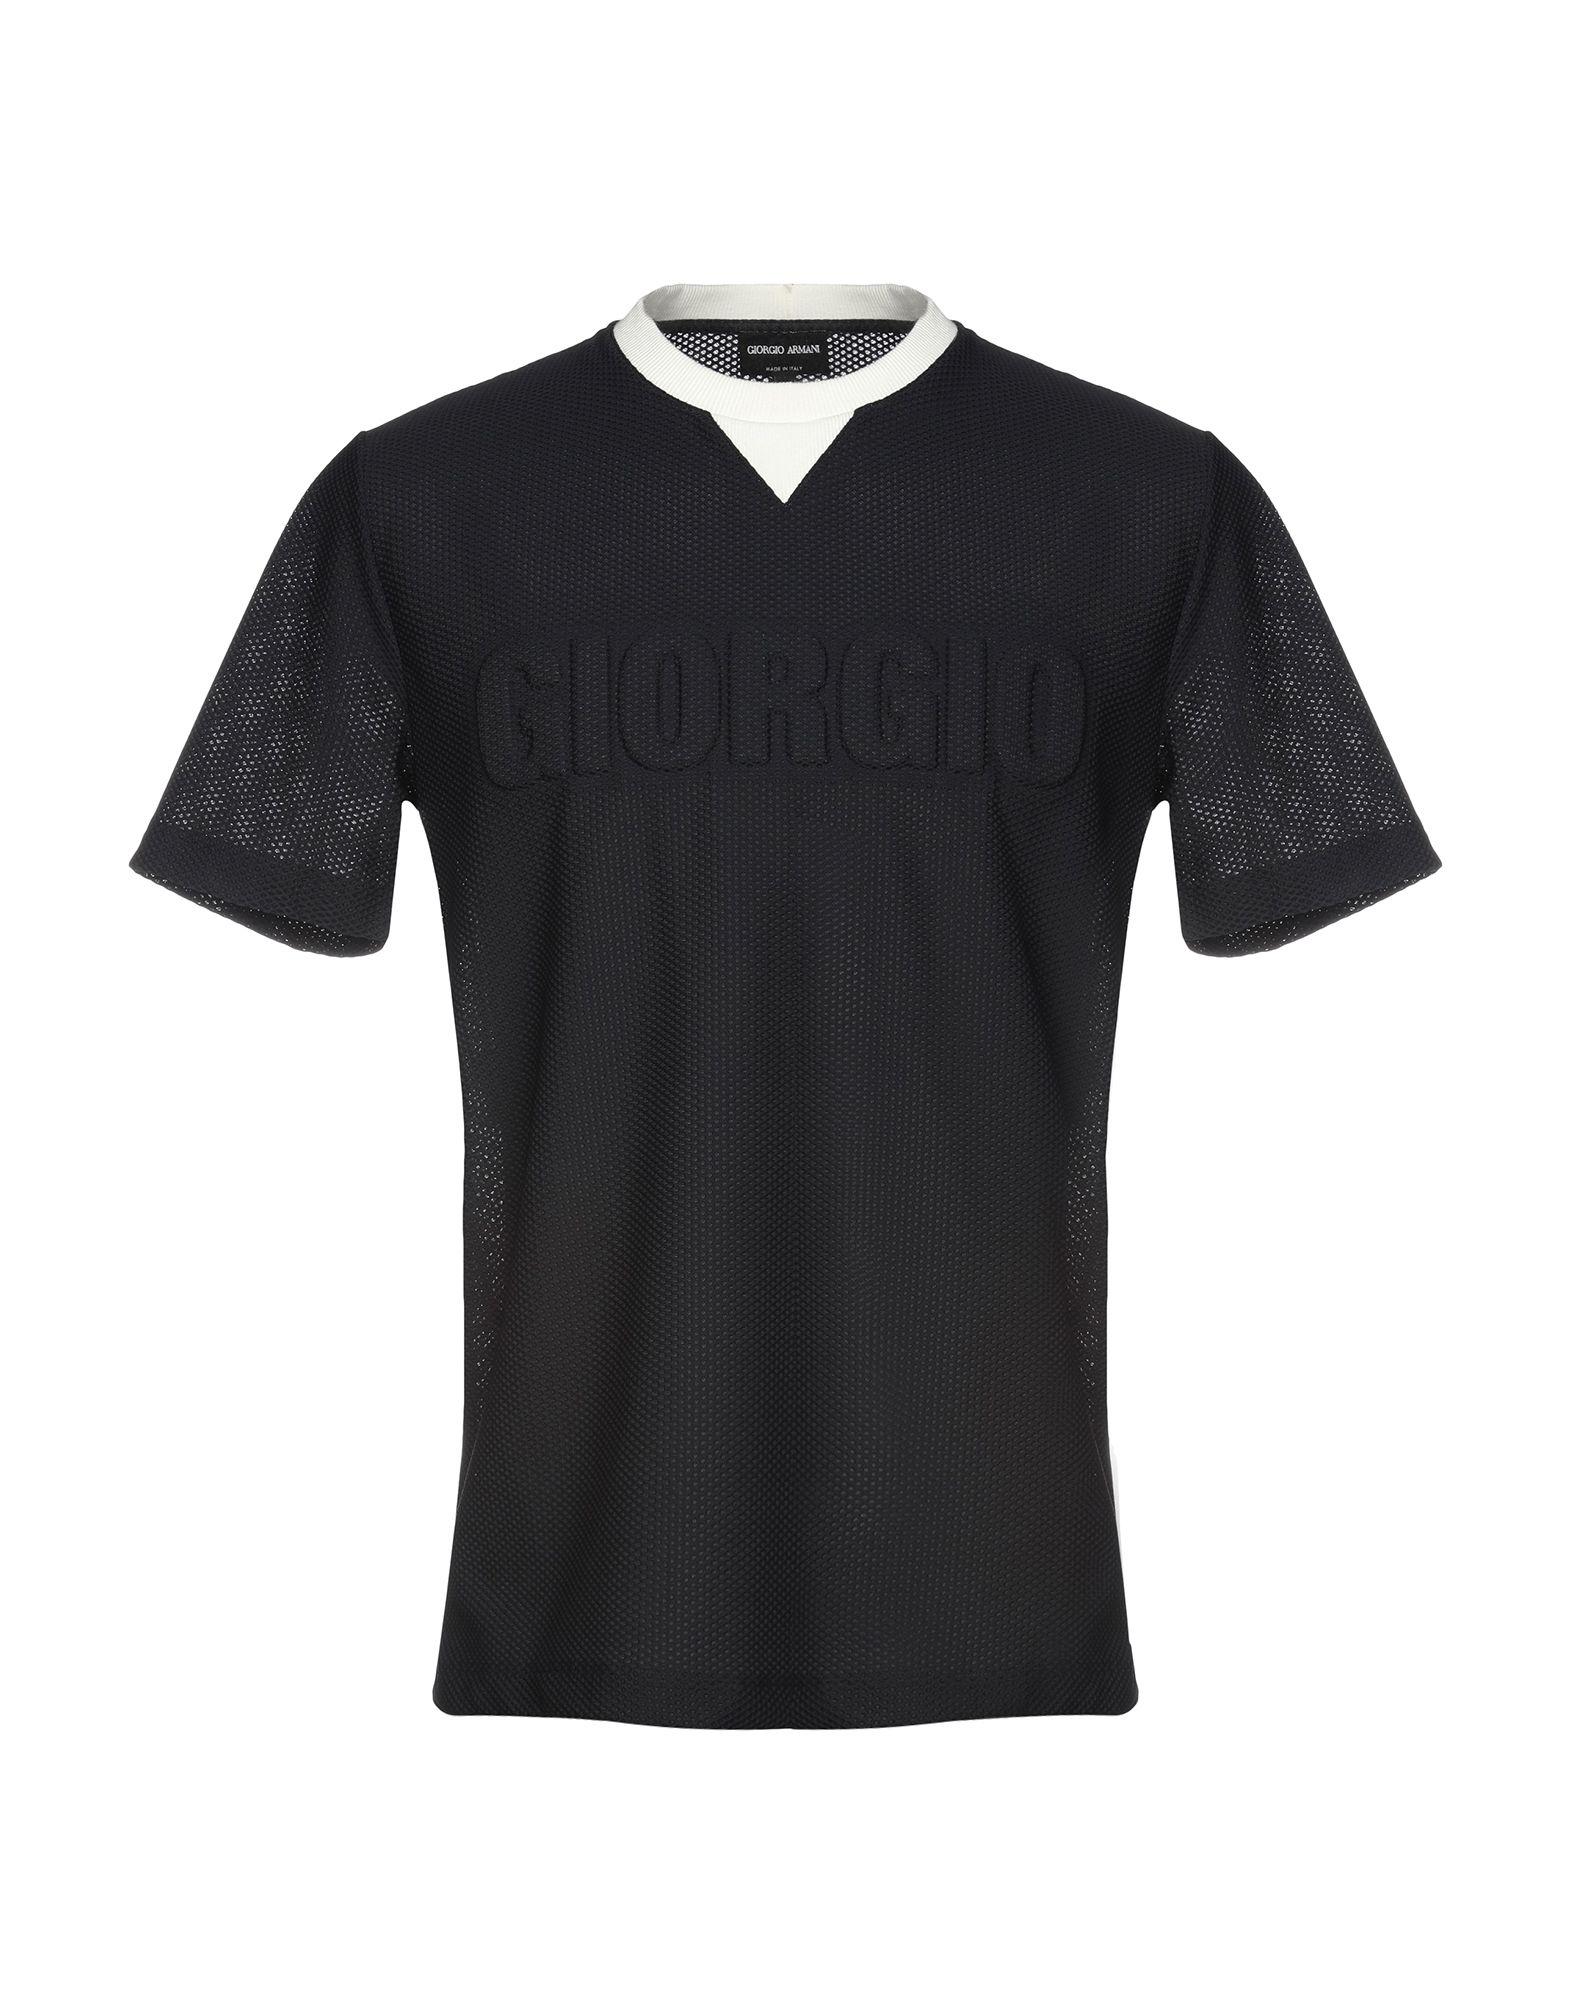 T-Shirt Giorgio Armani herren - 12233415ON